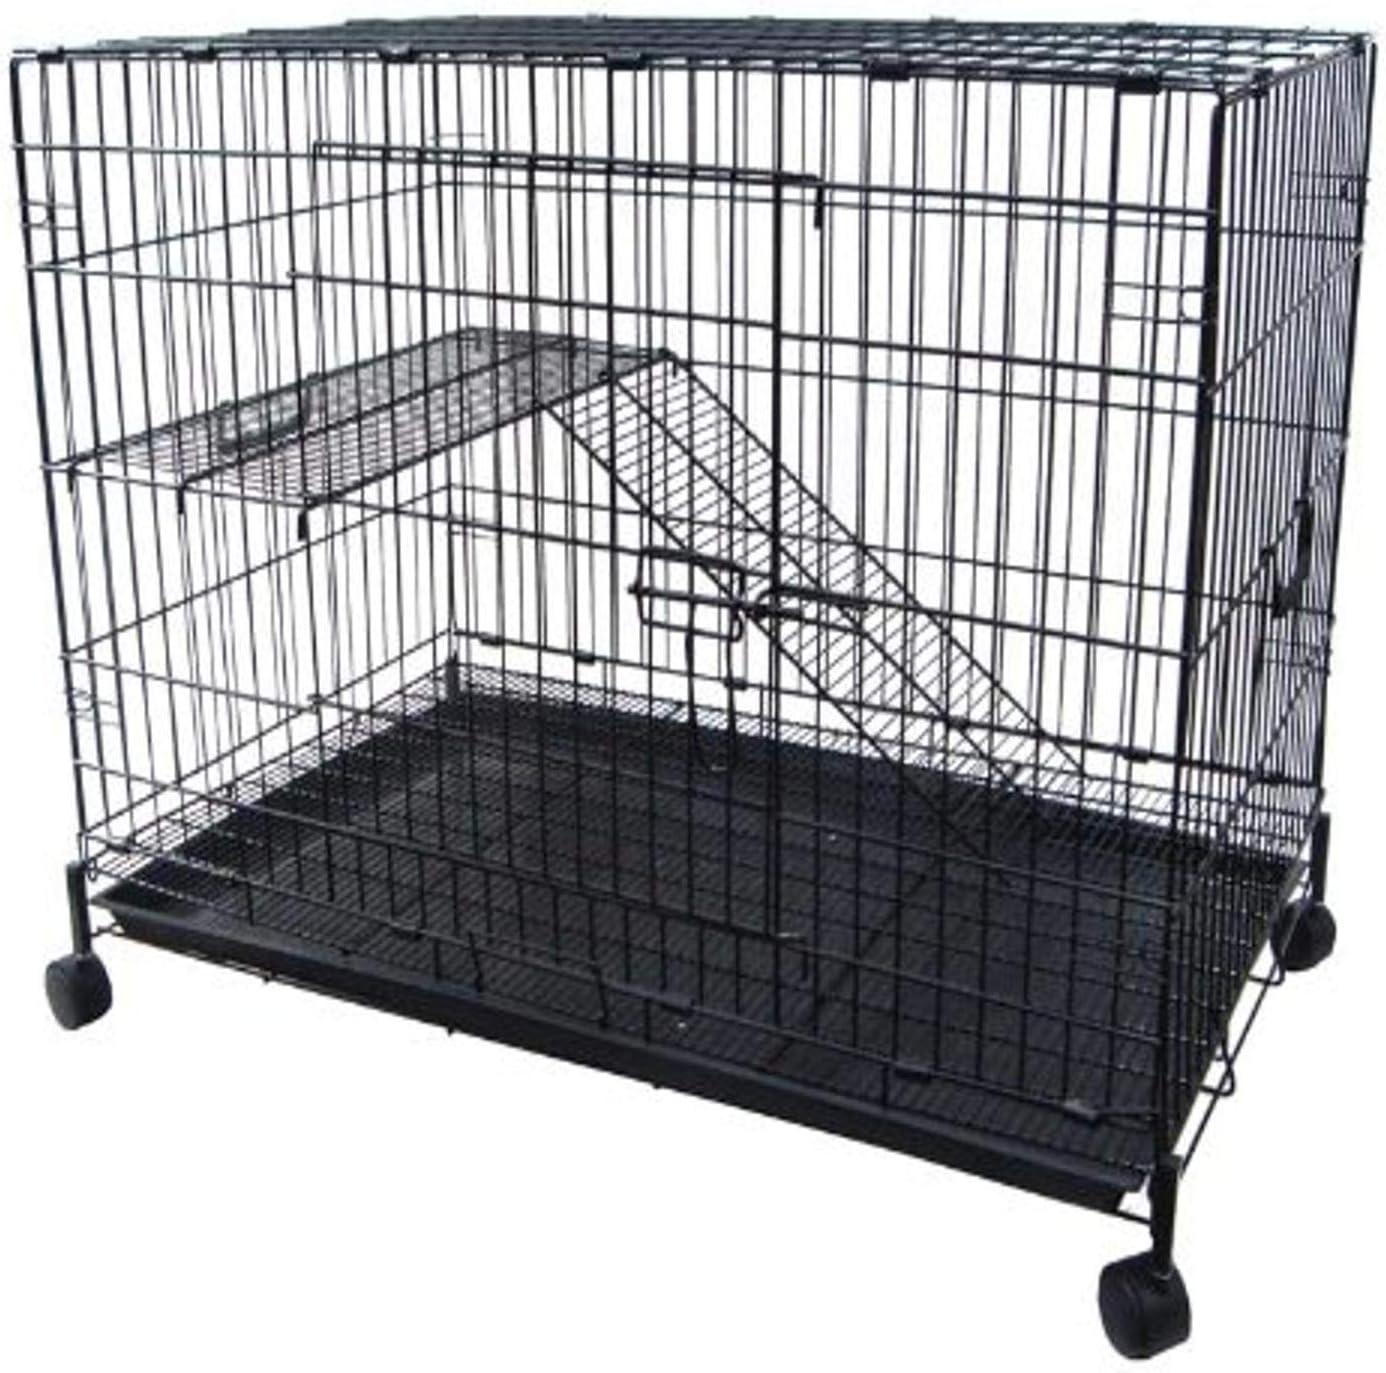 YML 2-Level Small Animal Chichilla Cat Ferret Cage, Black